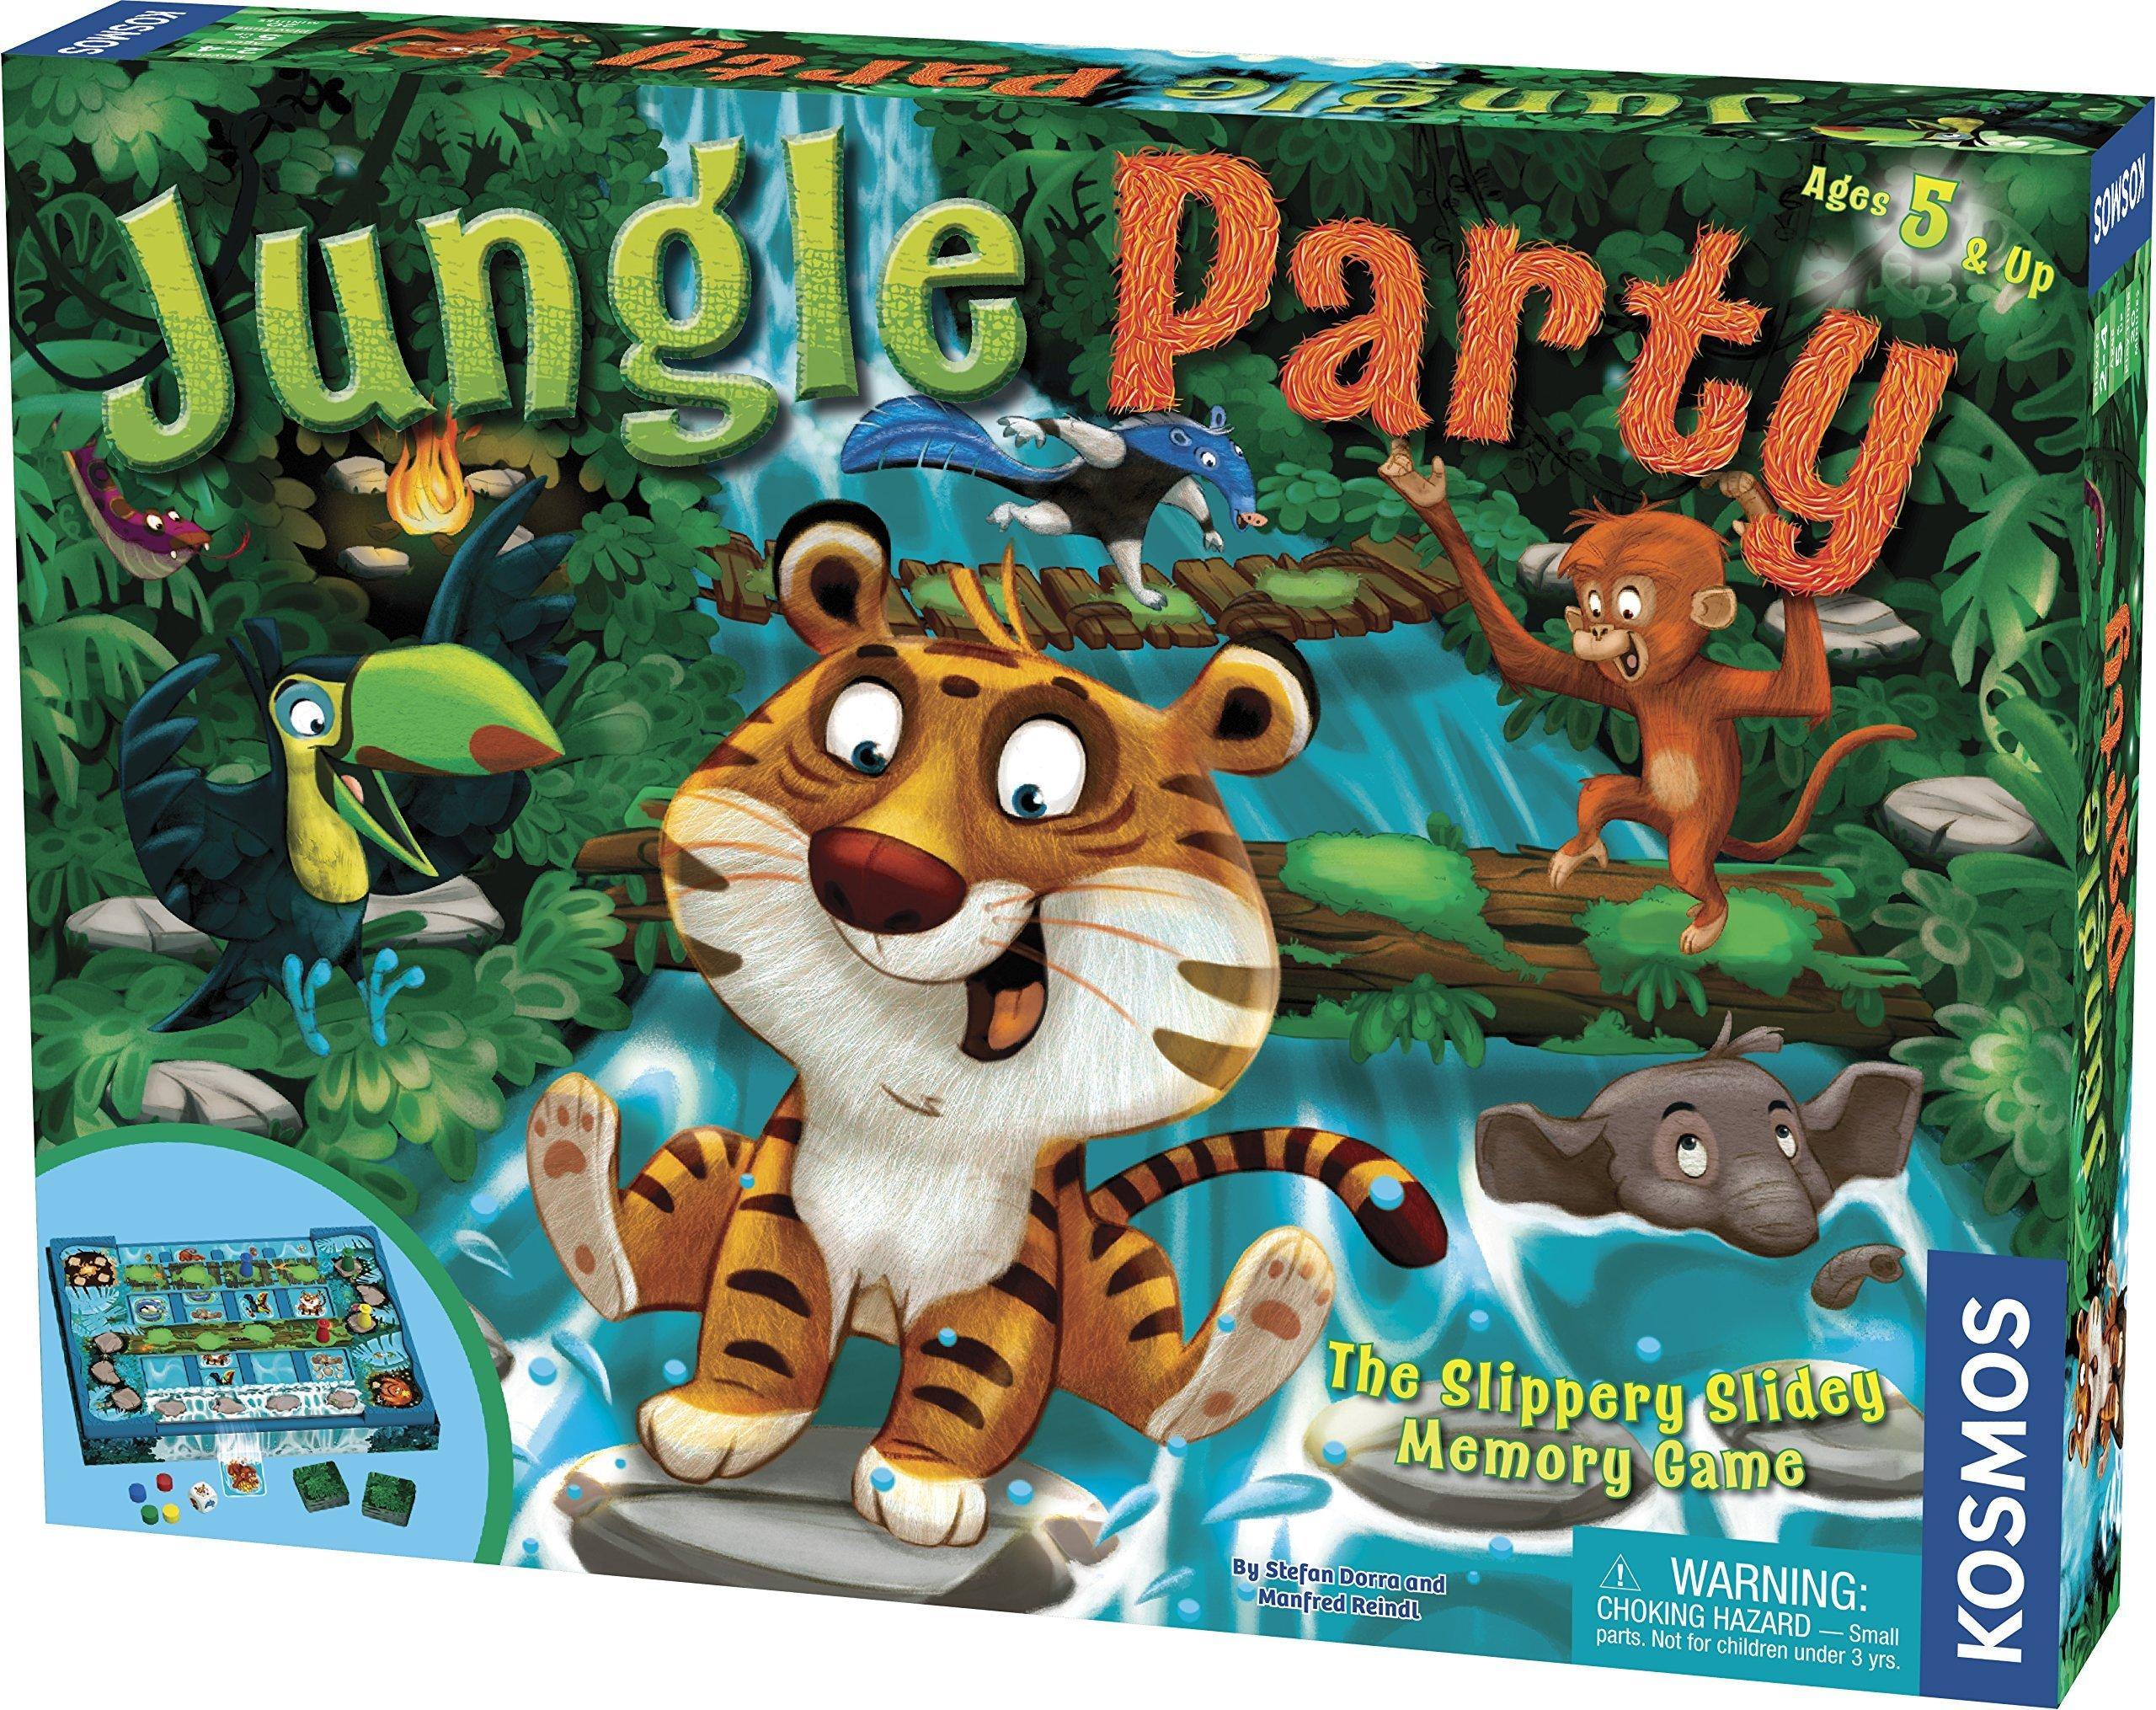 Thames & Kosmos Jungle Party Game